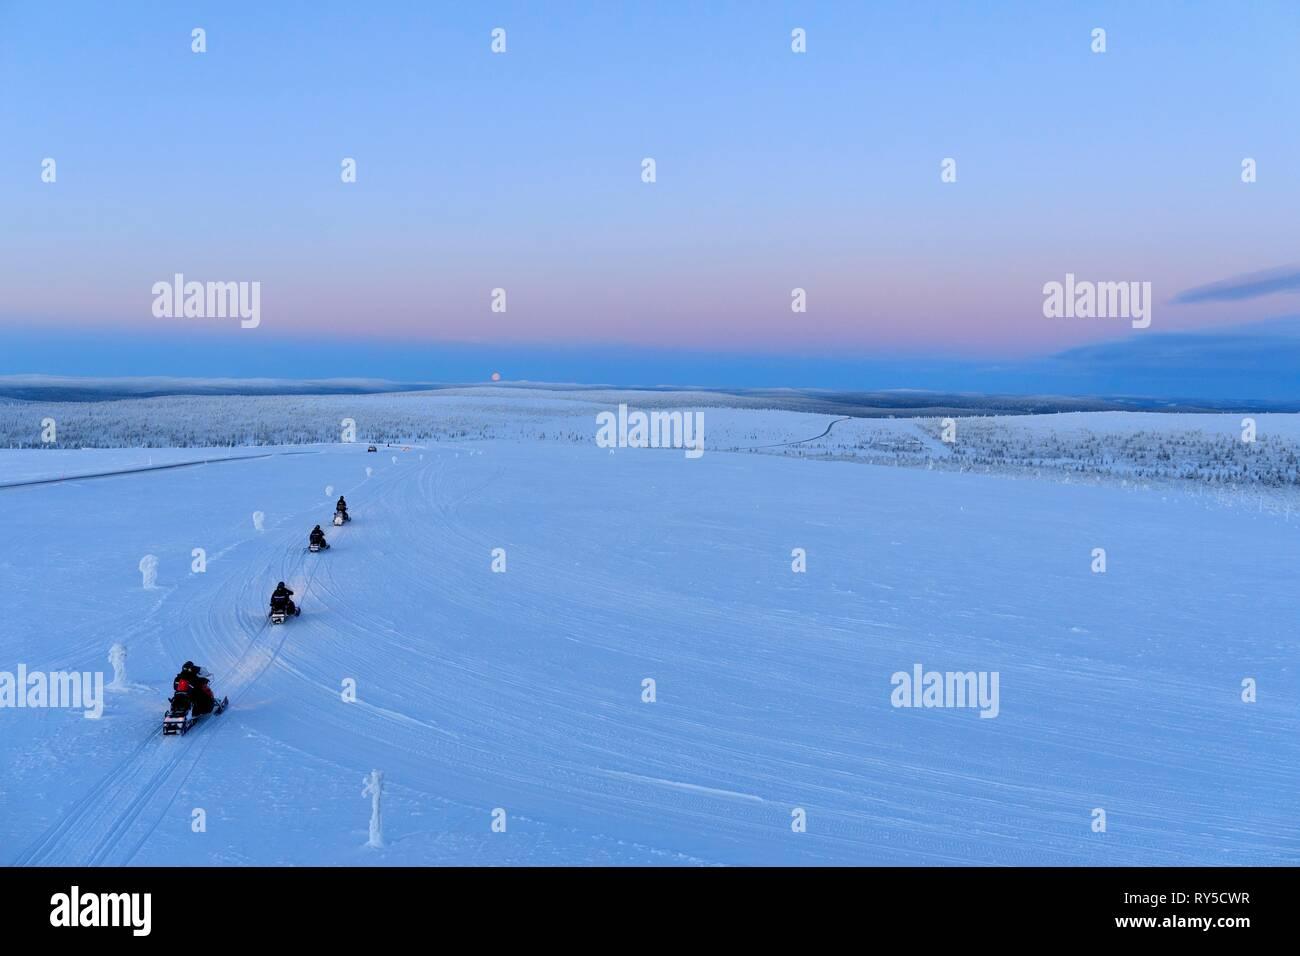 Finland, Lapland province, Inari, Saariselka, Kaunispaa Summit - Stock Image